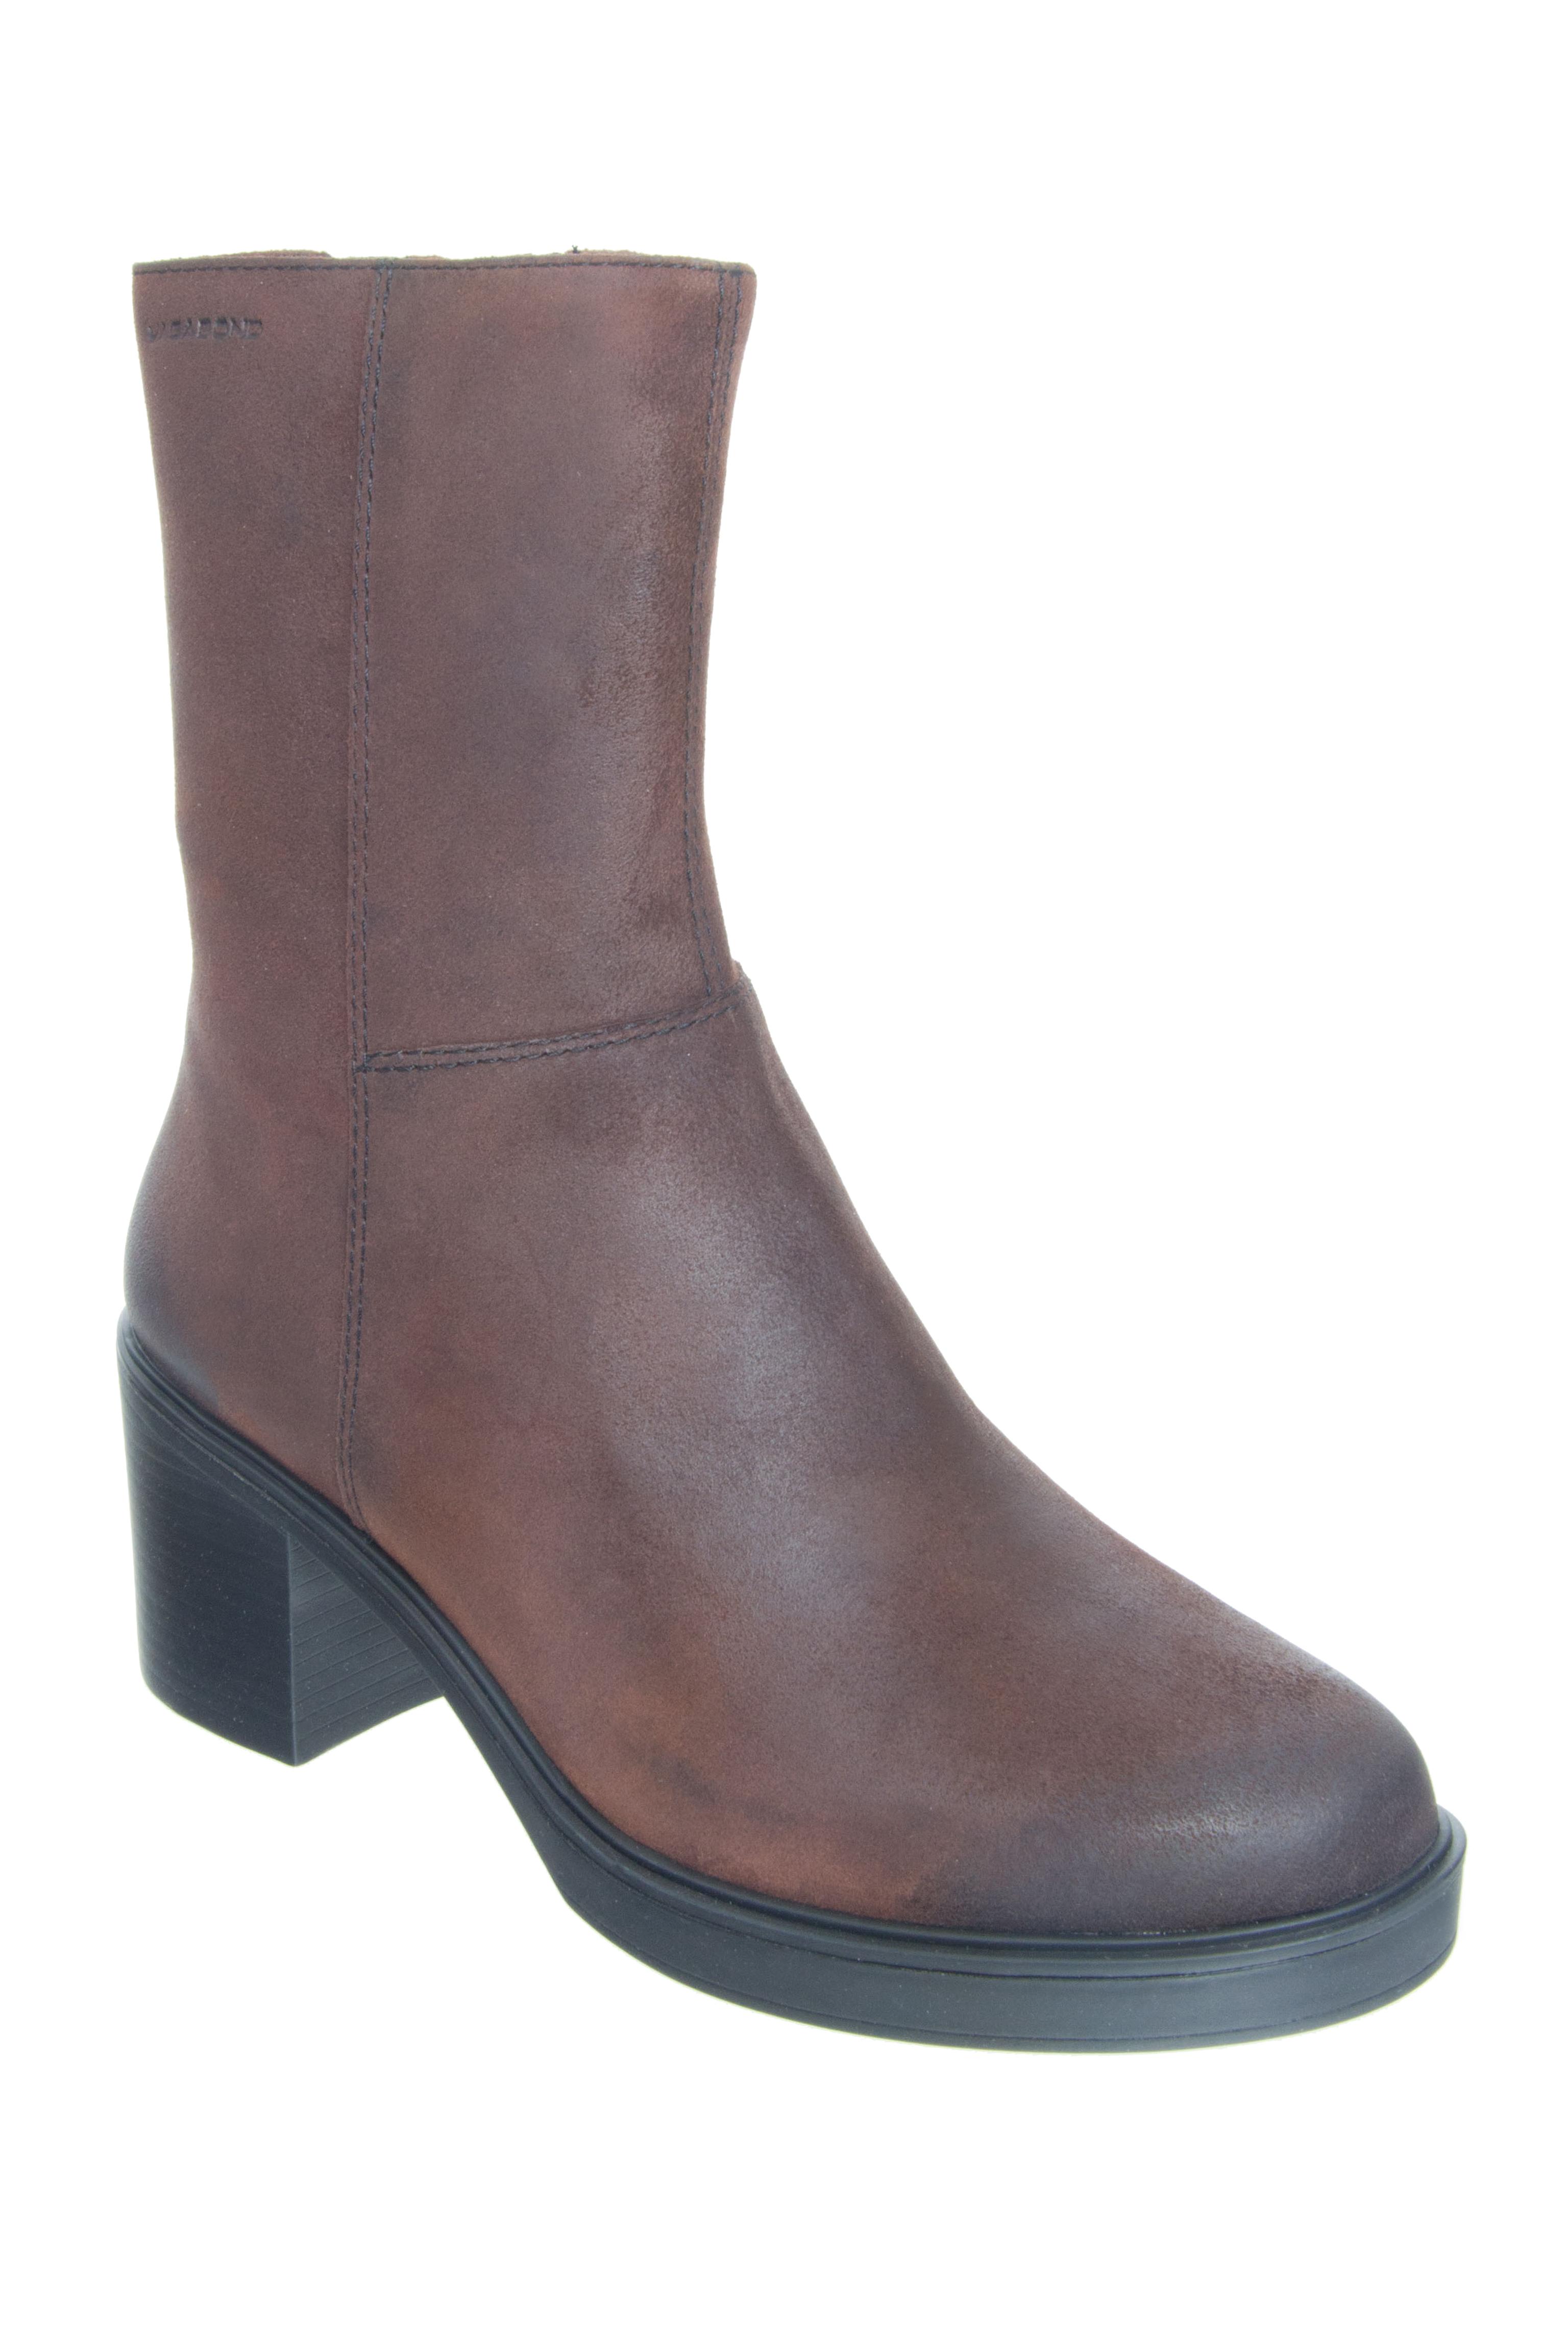 Vagabond Tilda Mid Heel Boots - Espresso